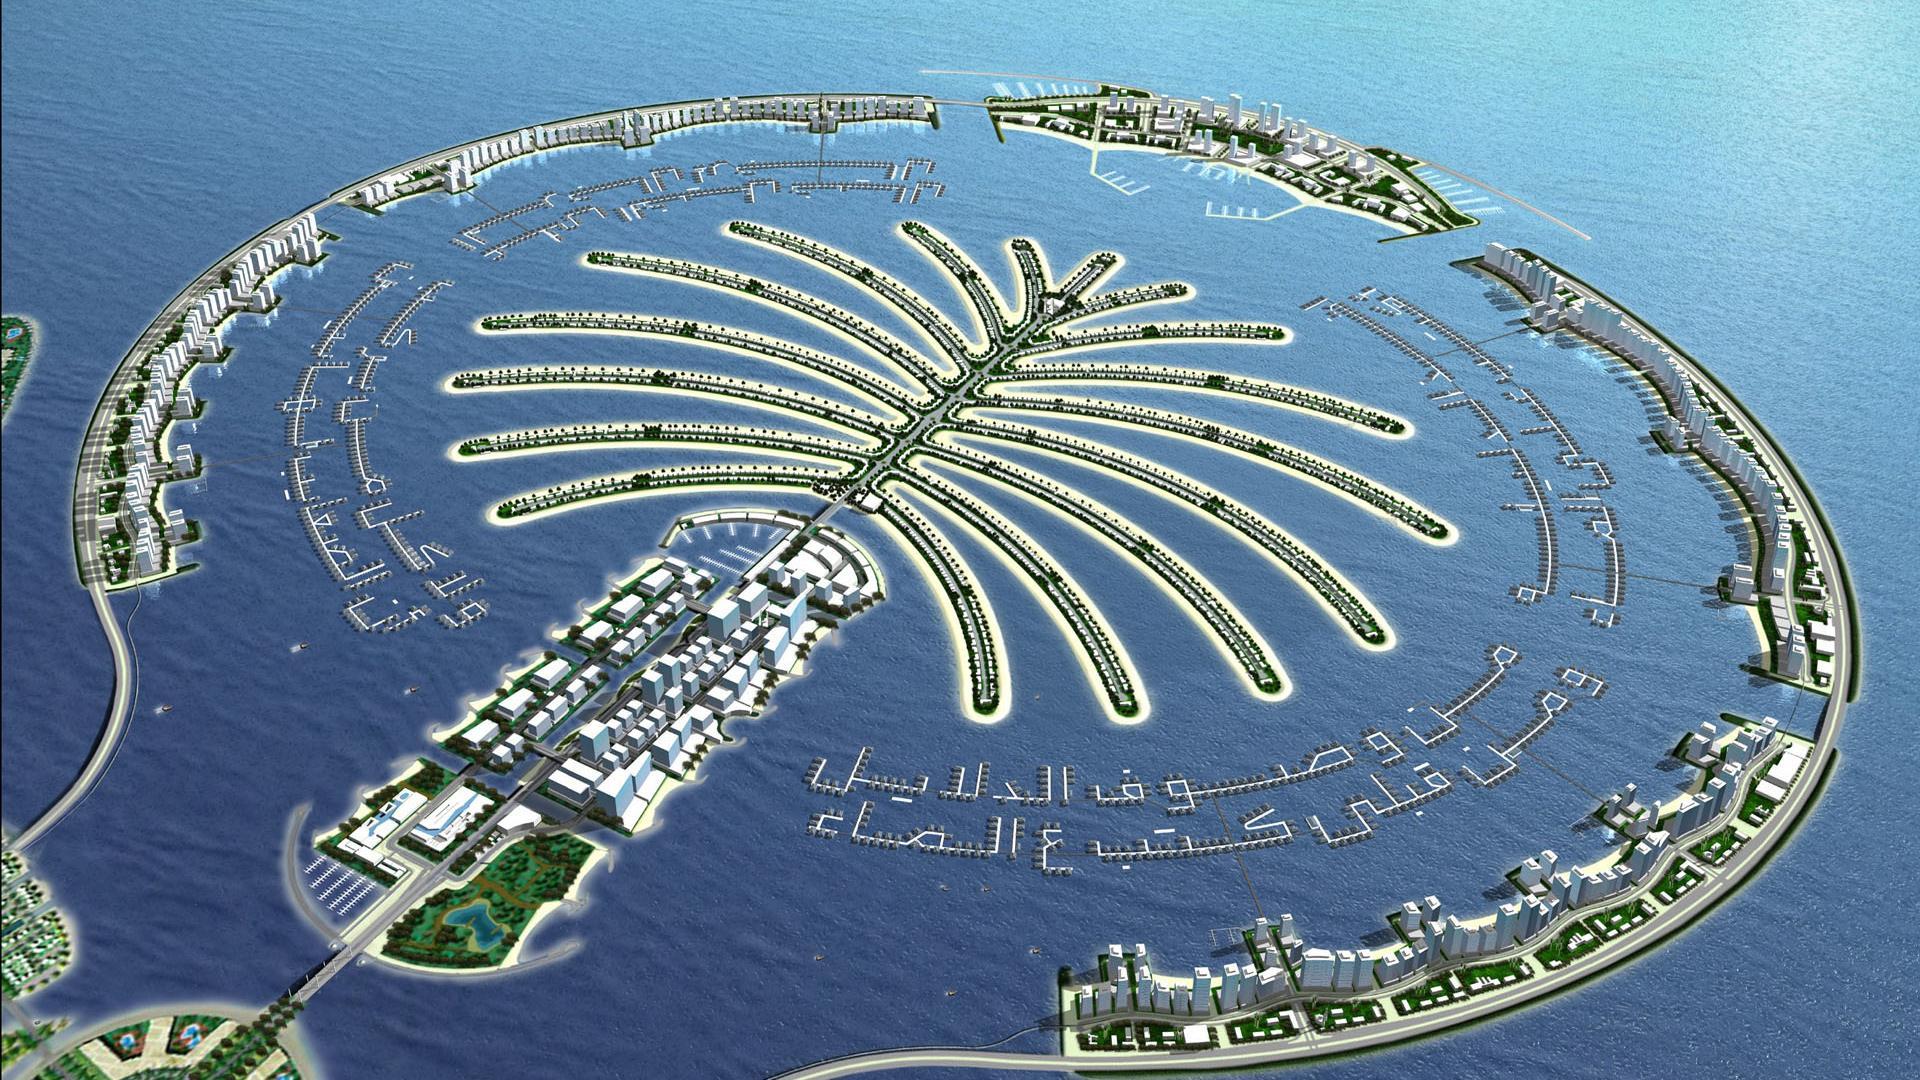 Palm Island Dubai City HD Wallpaper of City   hdwallpaper2013com 1920x1080